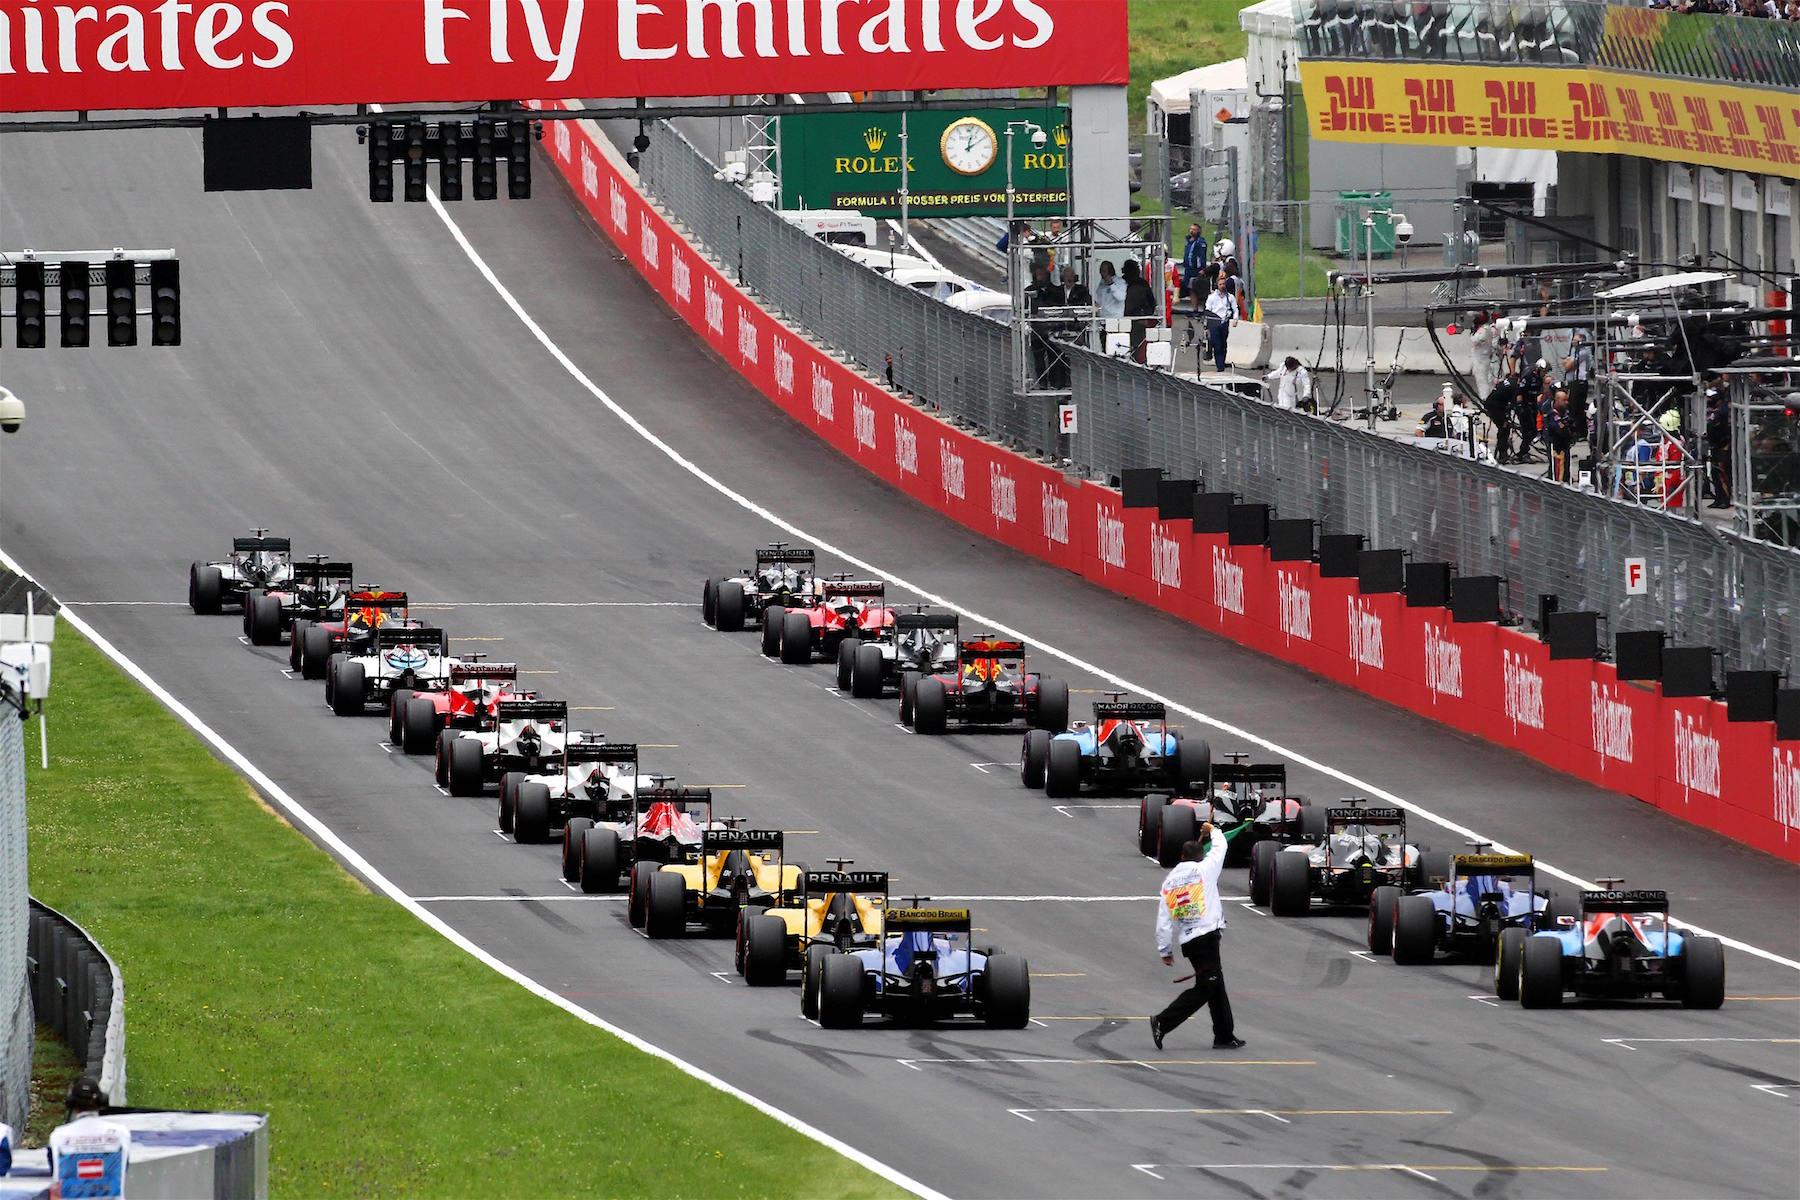 Salracing - The 2016 Austrian GP Starting Grid